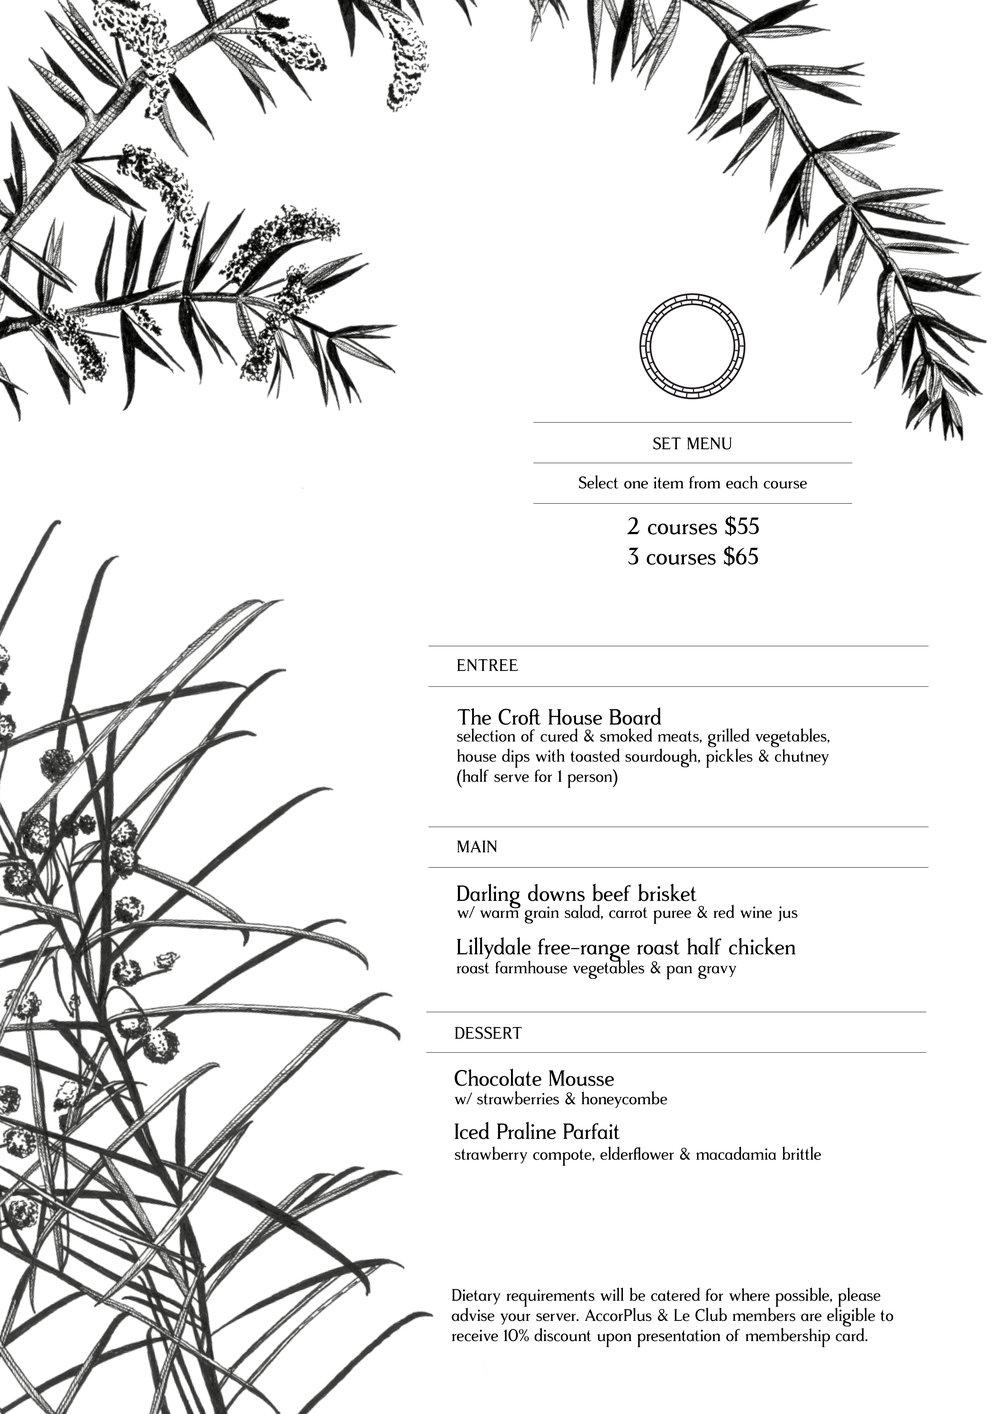 MY FAIR LADY Set menu.jpg